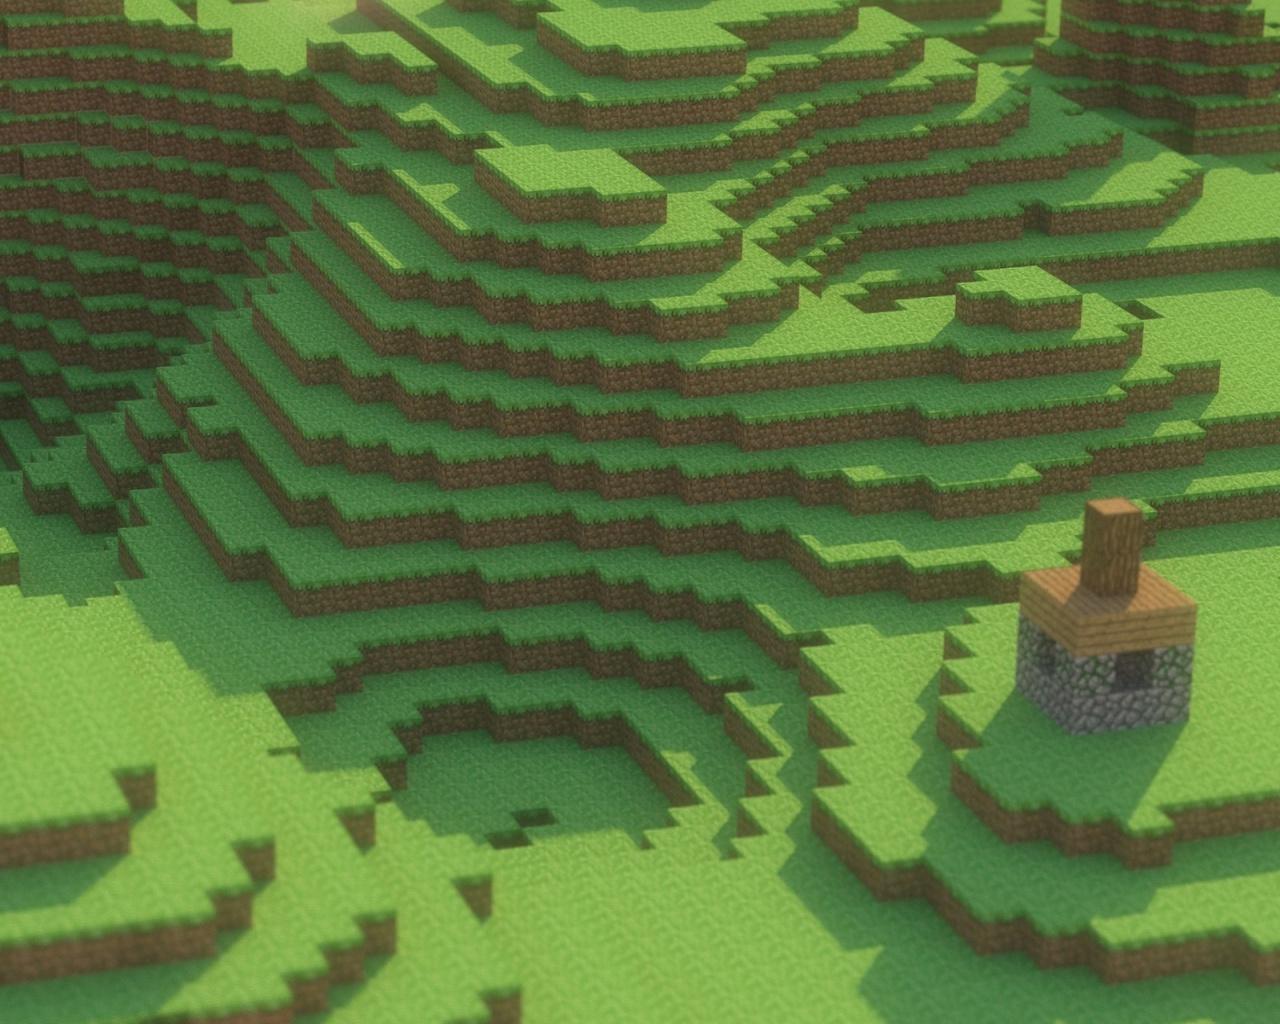 1280x1024 Minecraft desktop PC and Mac wallpaper 1280x1024